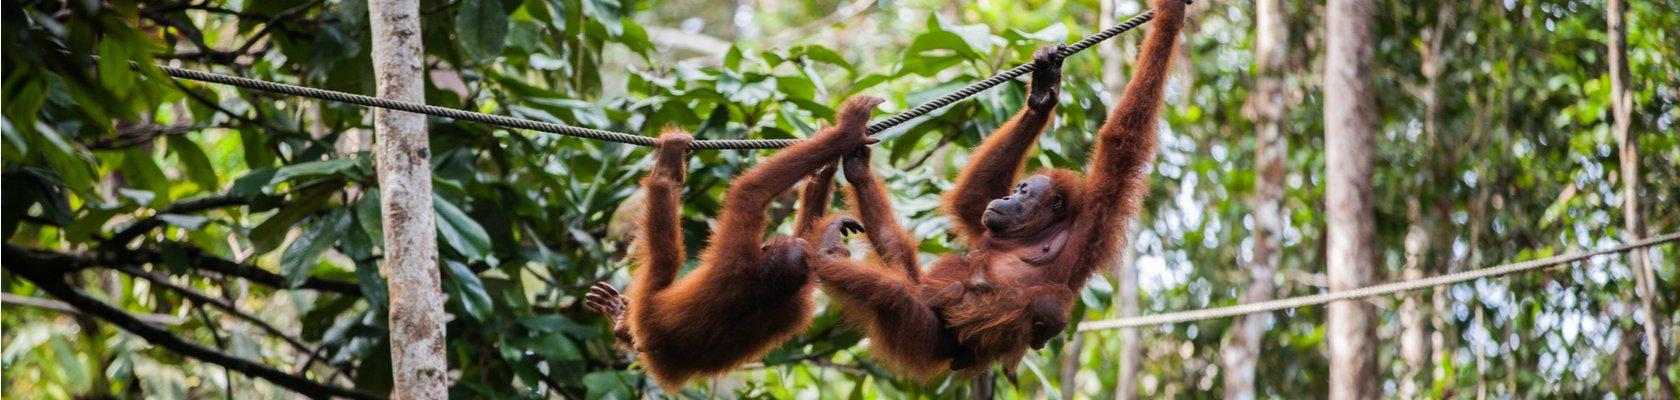 orang-oetans in het Gunung Leuser park